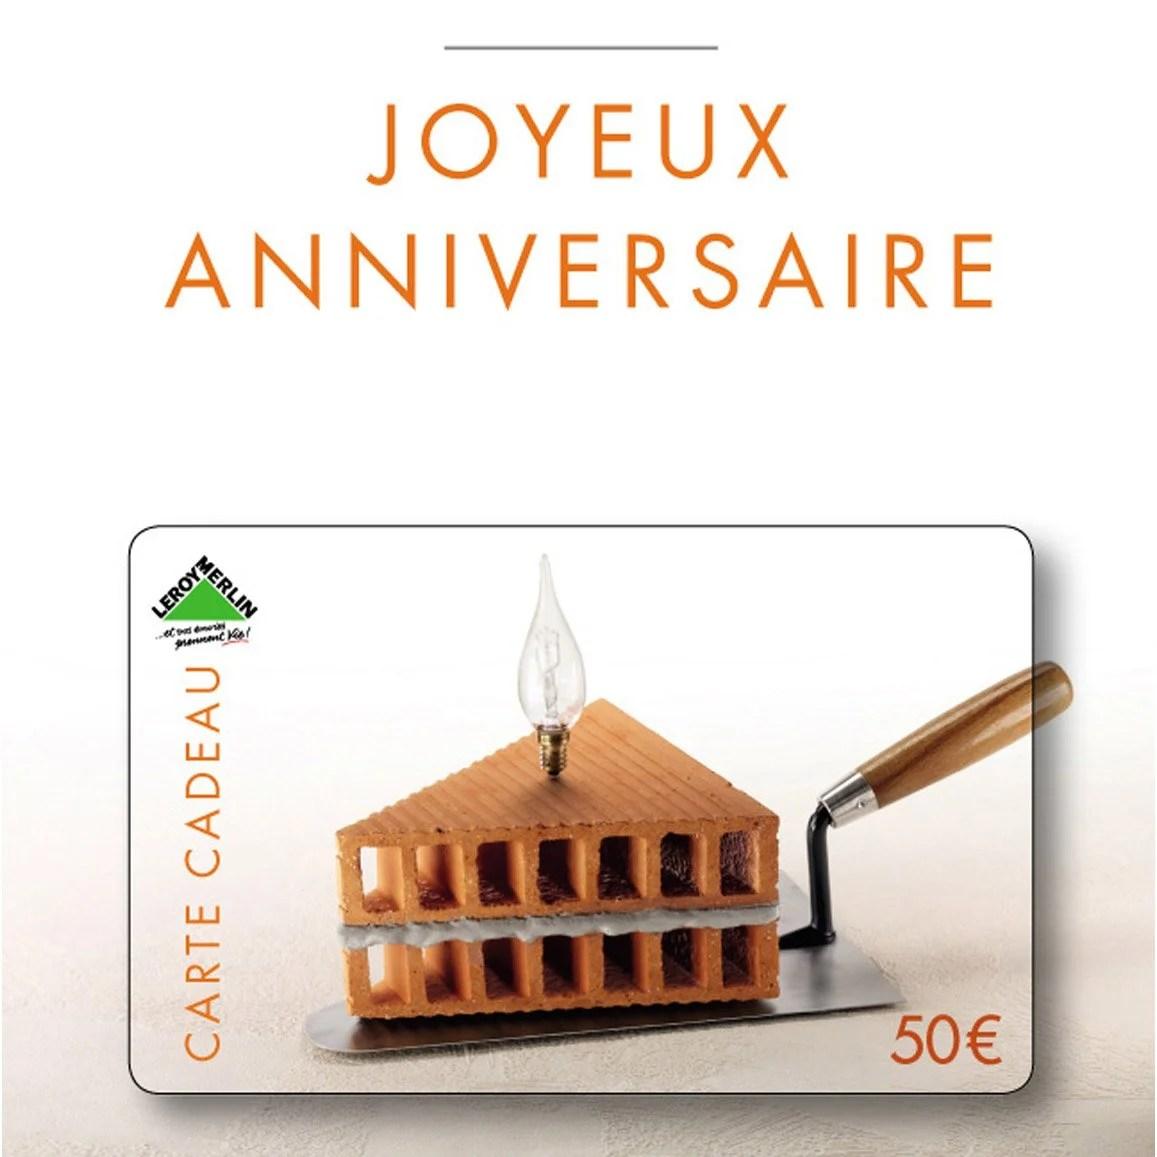 Carte Cadeau Joyeux Anniversaire 50 Euros Leroy Merlin